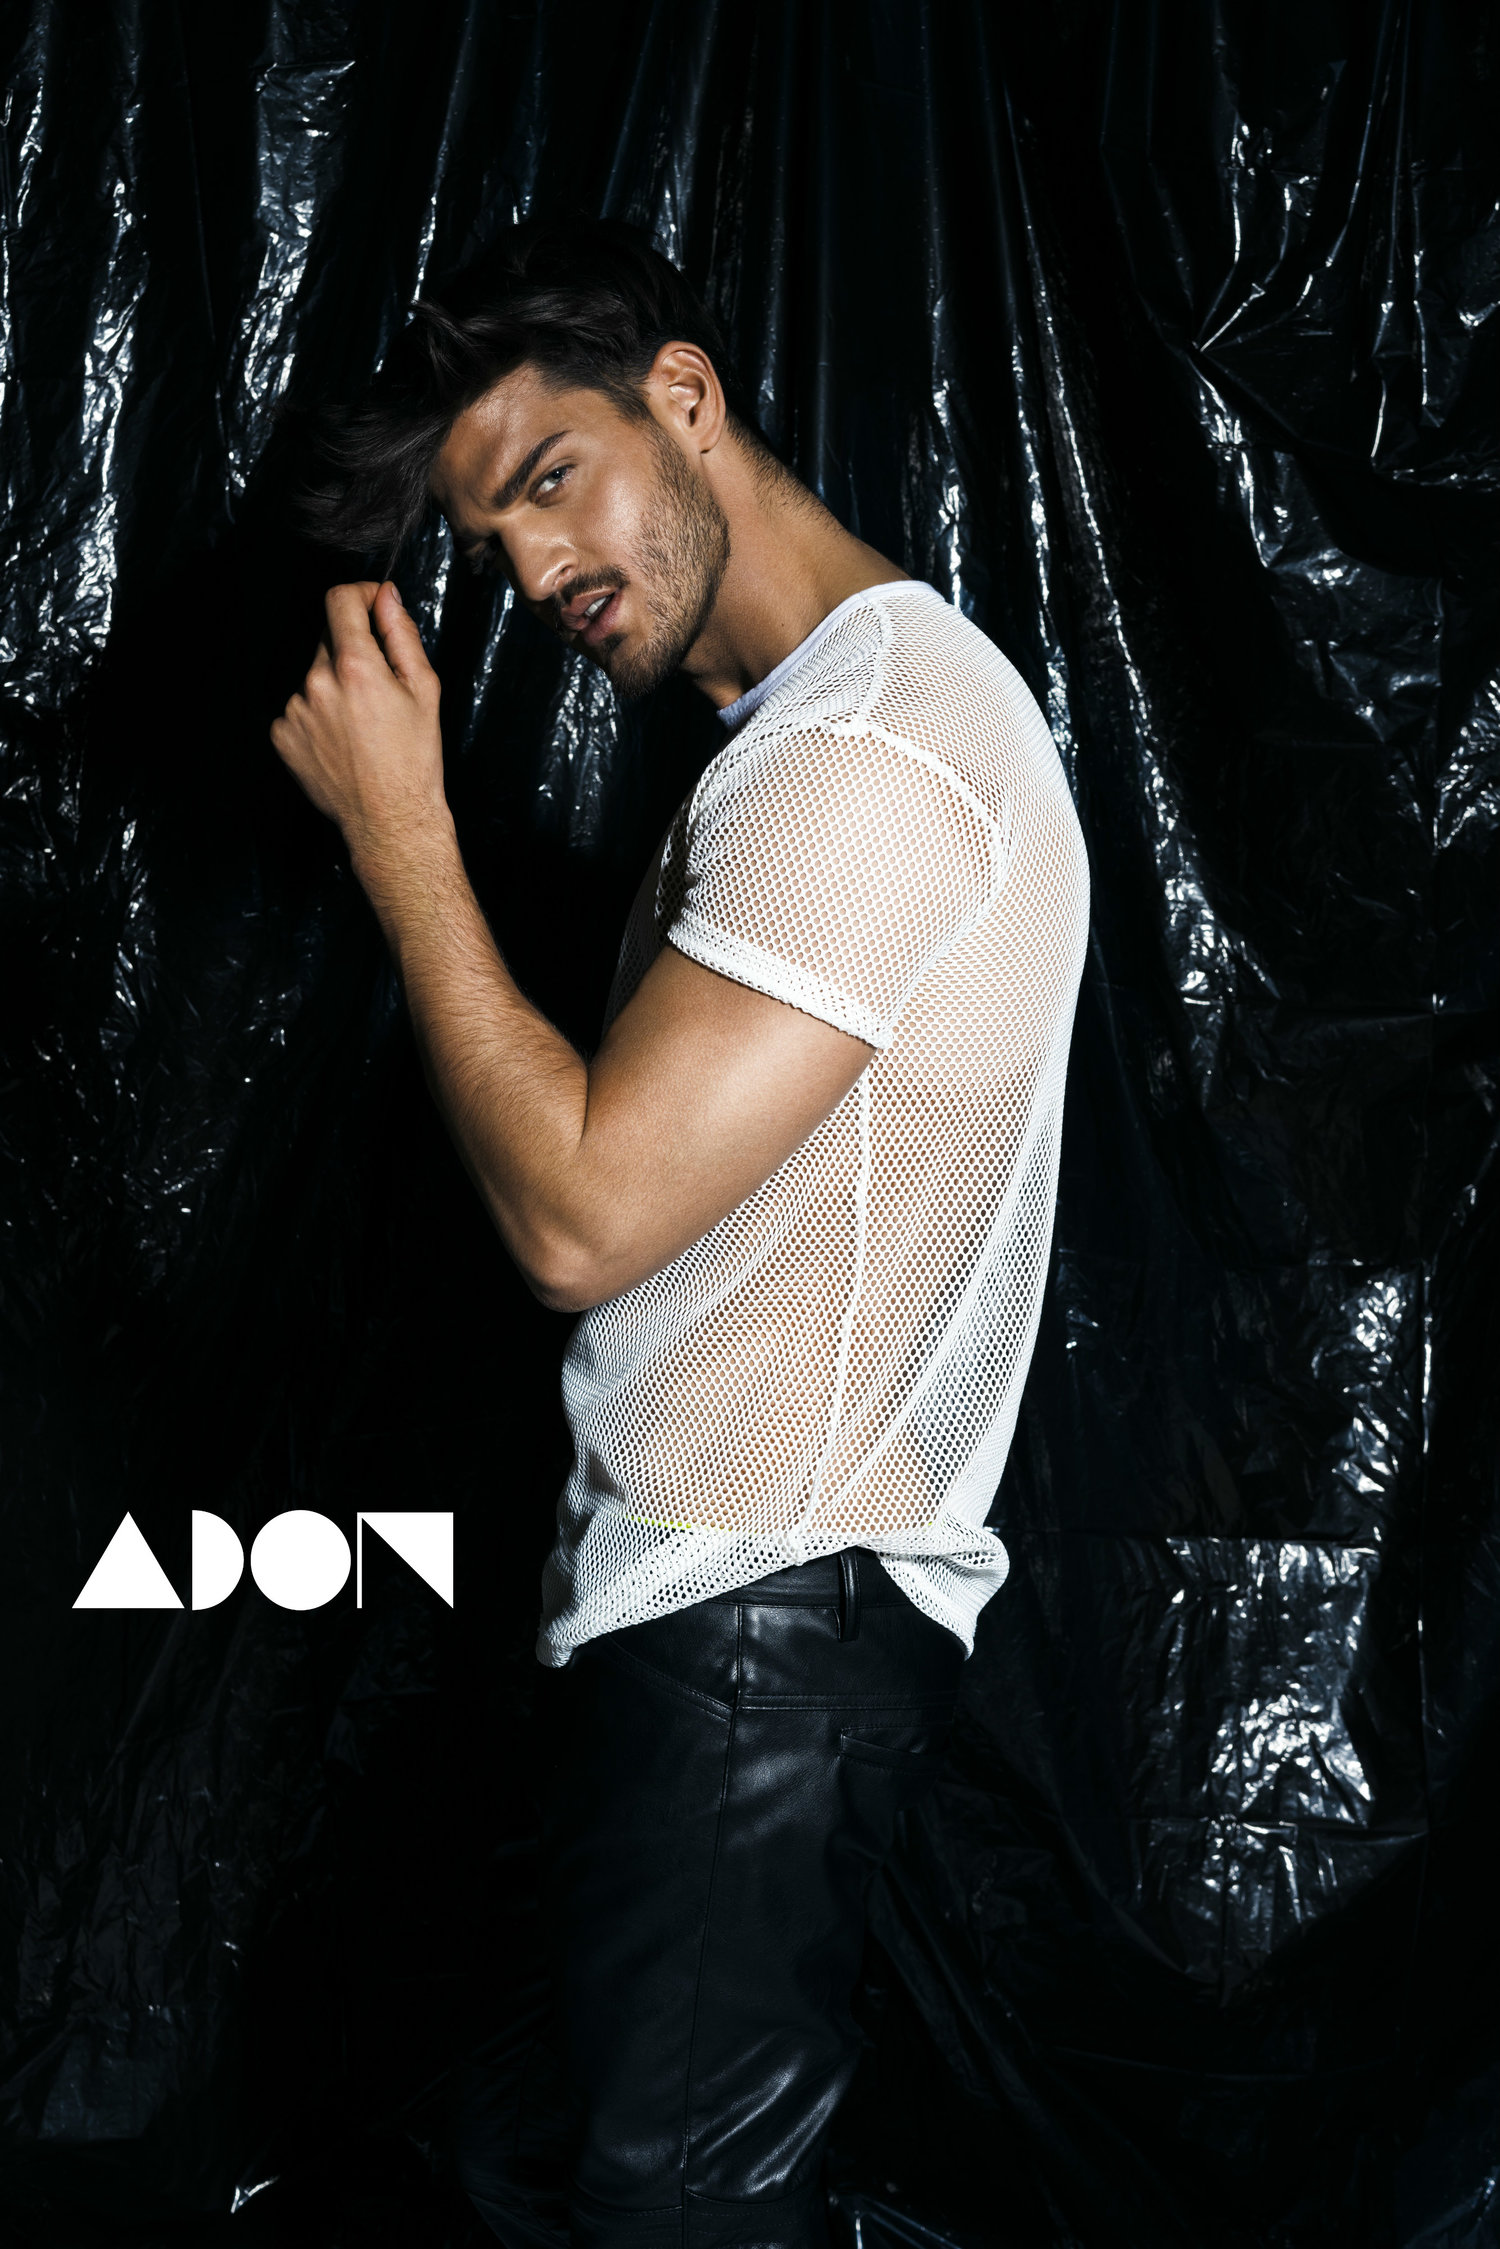 Adon Exclusive: Model David Habibi By Domenic Hartmann